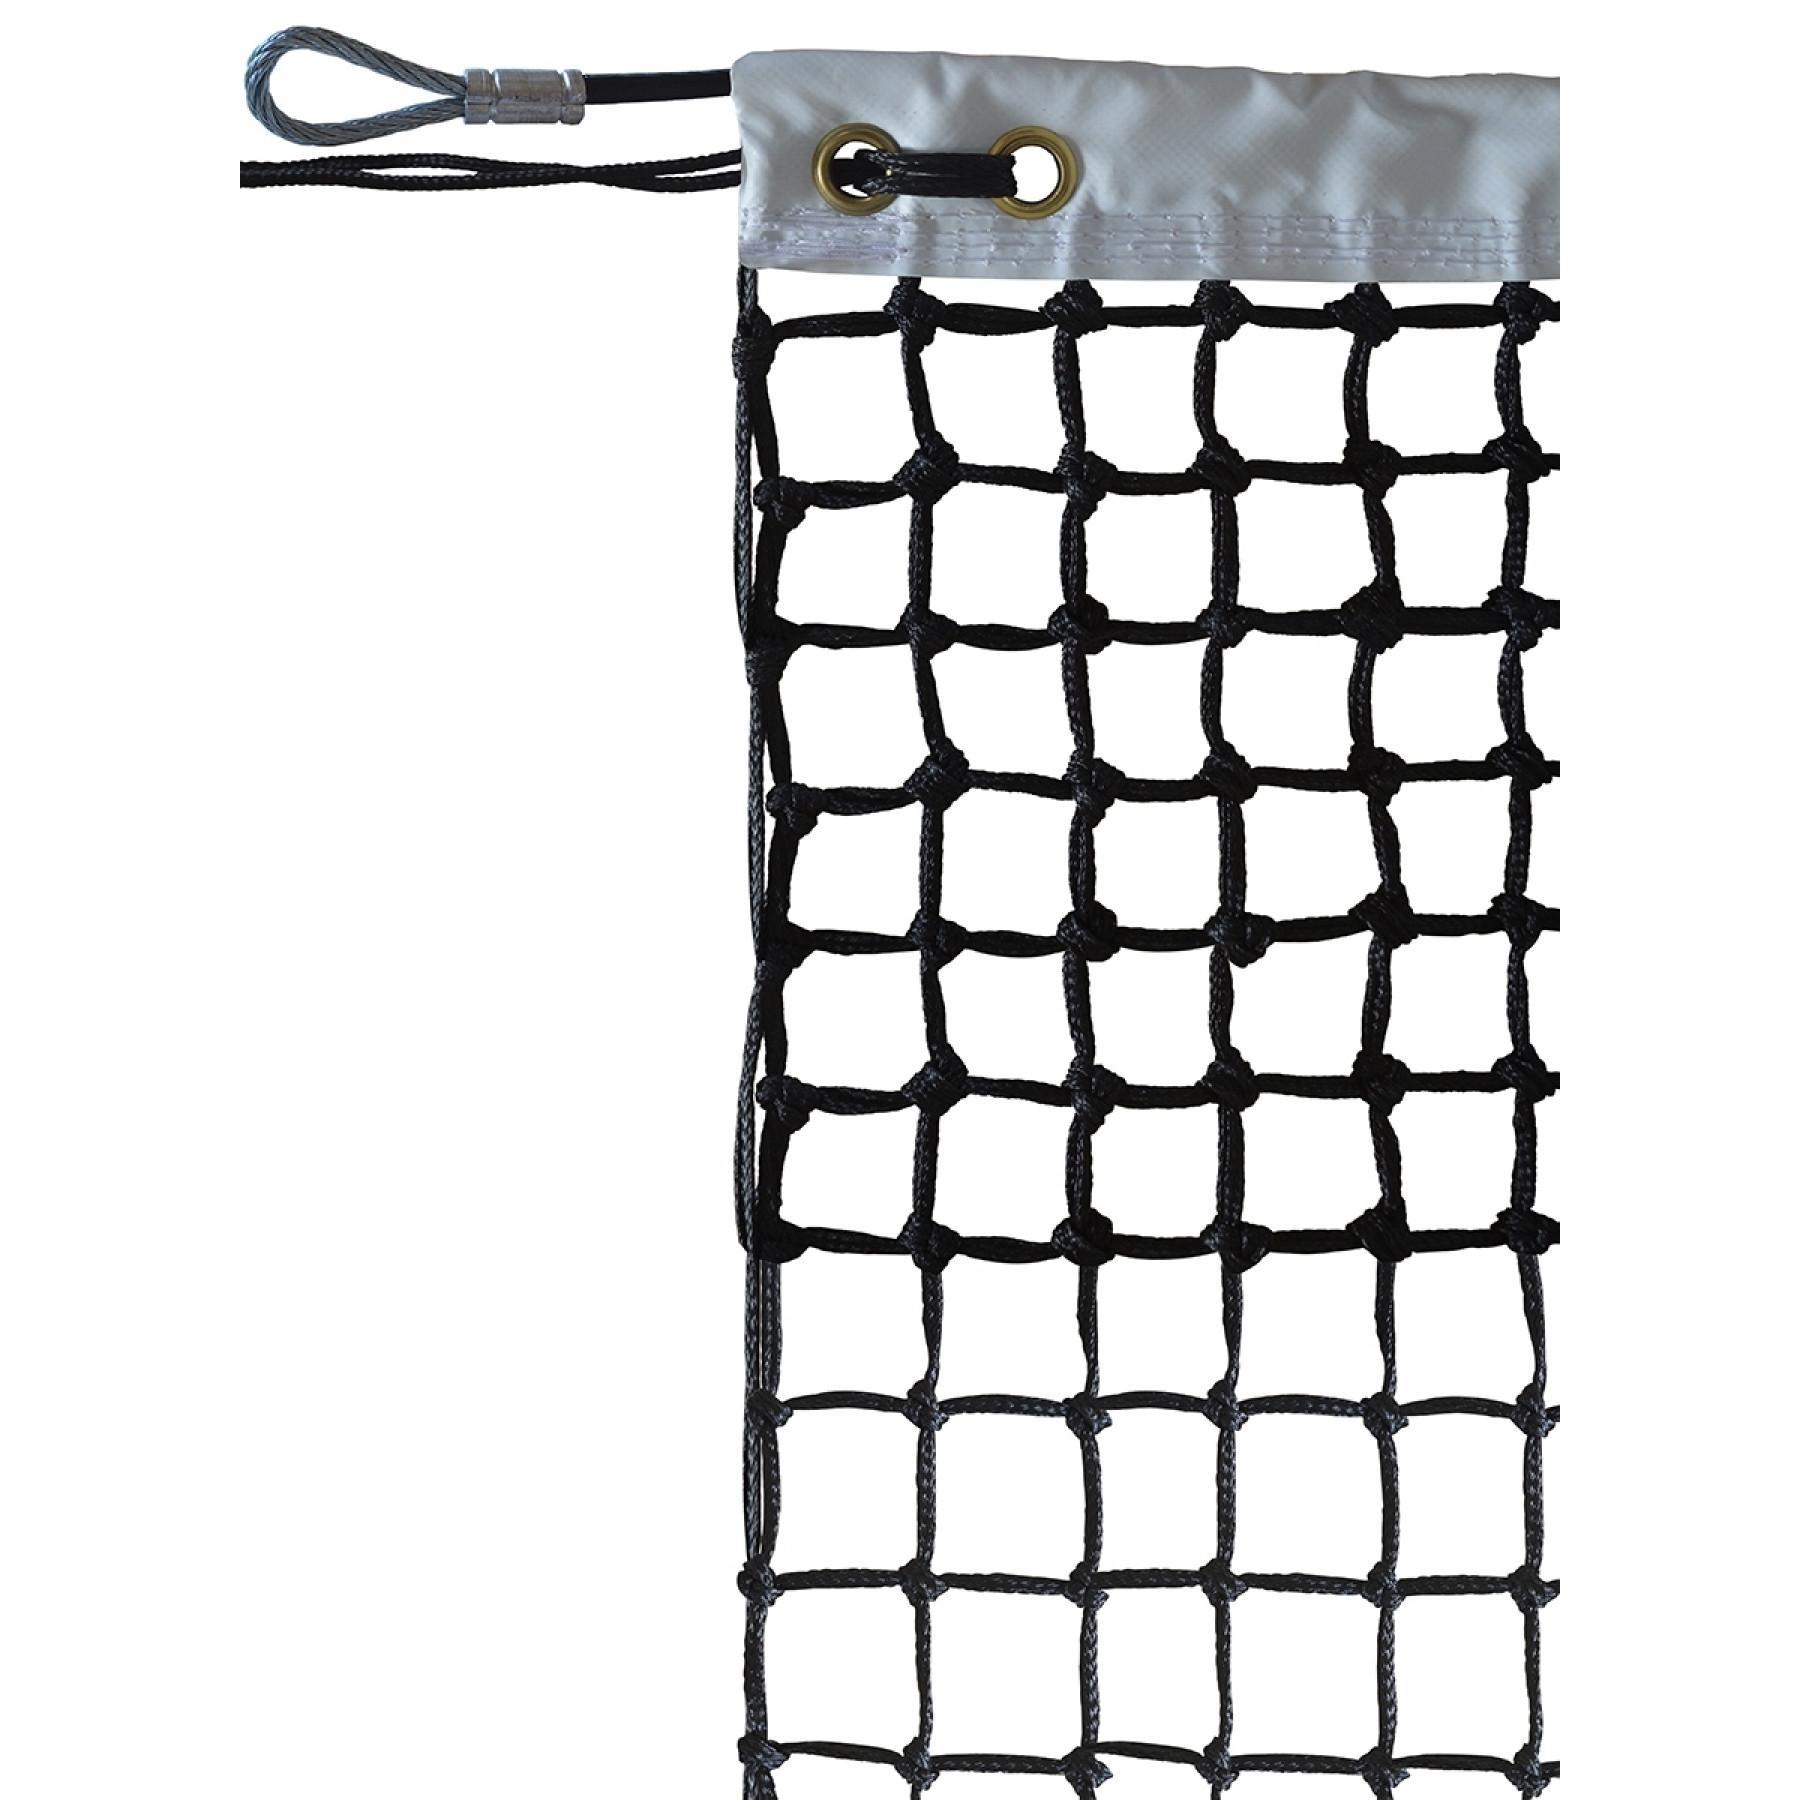 Tennis net roland garros pe braided 3mm mesh 40 doubled on 7 rows Sporti France